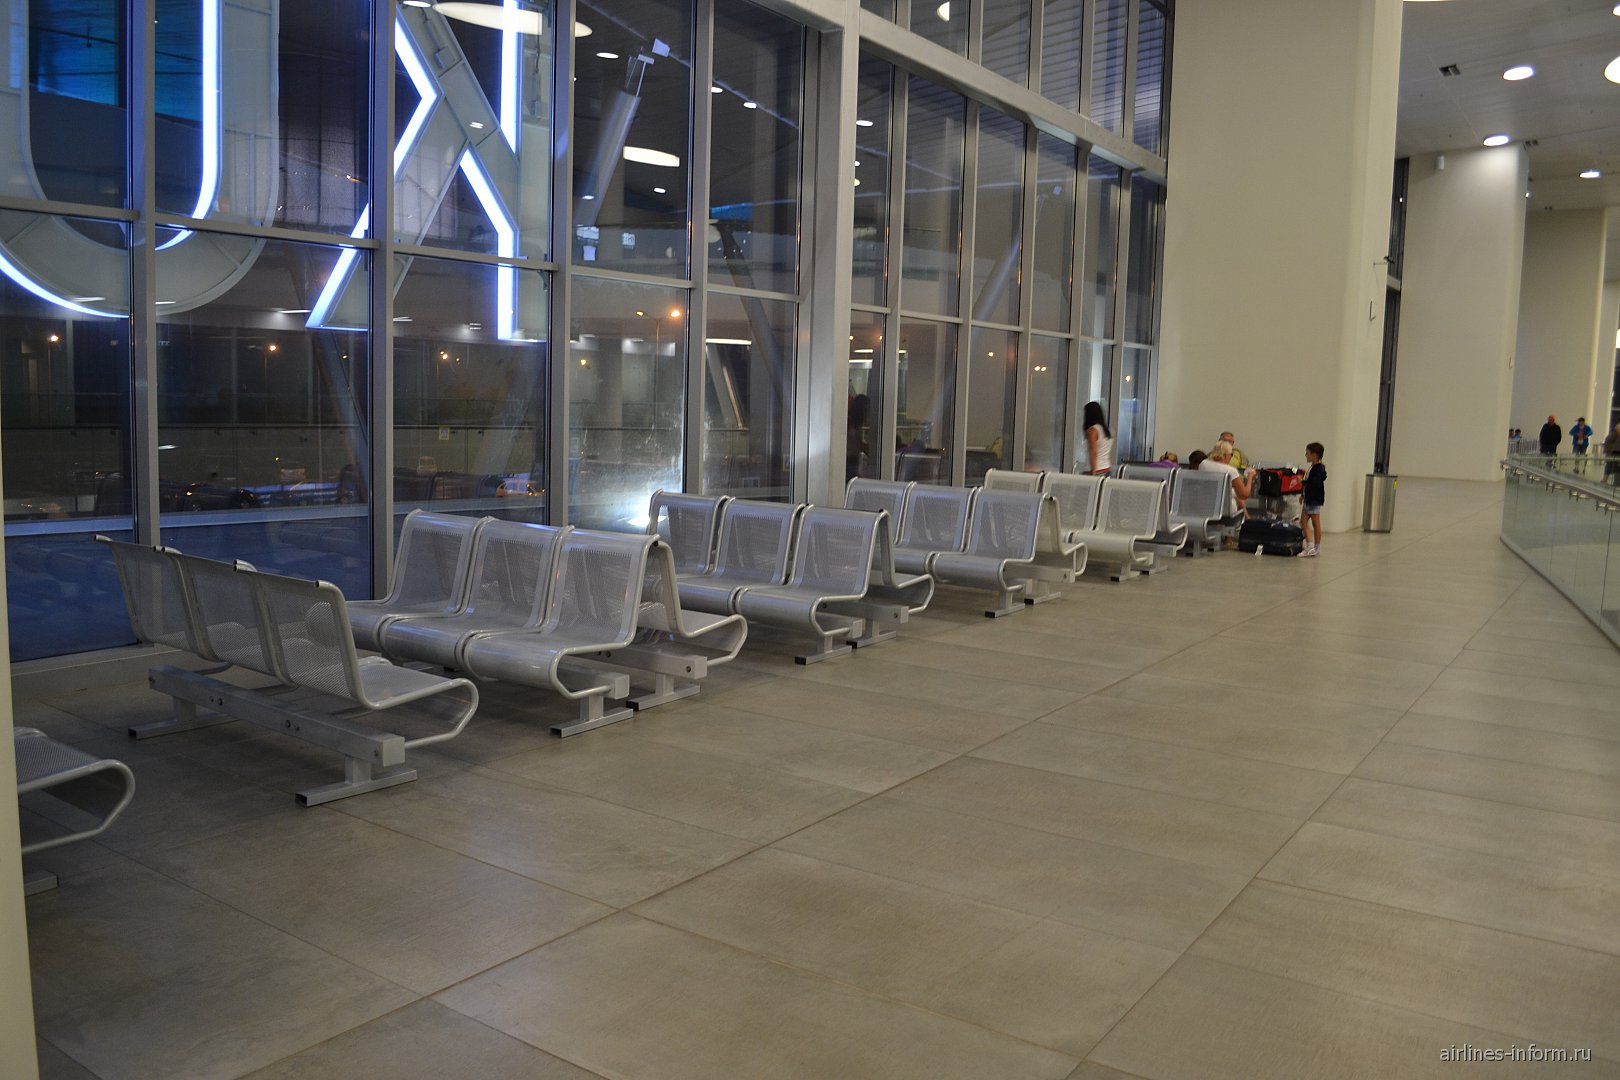 Зал ожидания на 2-м этаже в аэропорту Самара Курумоч